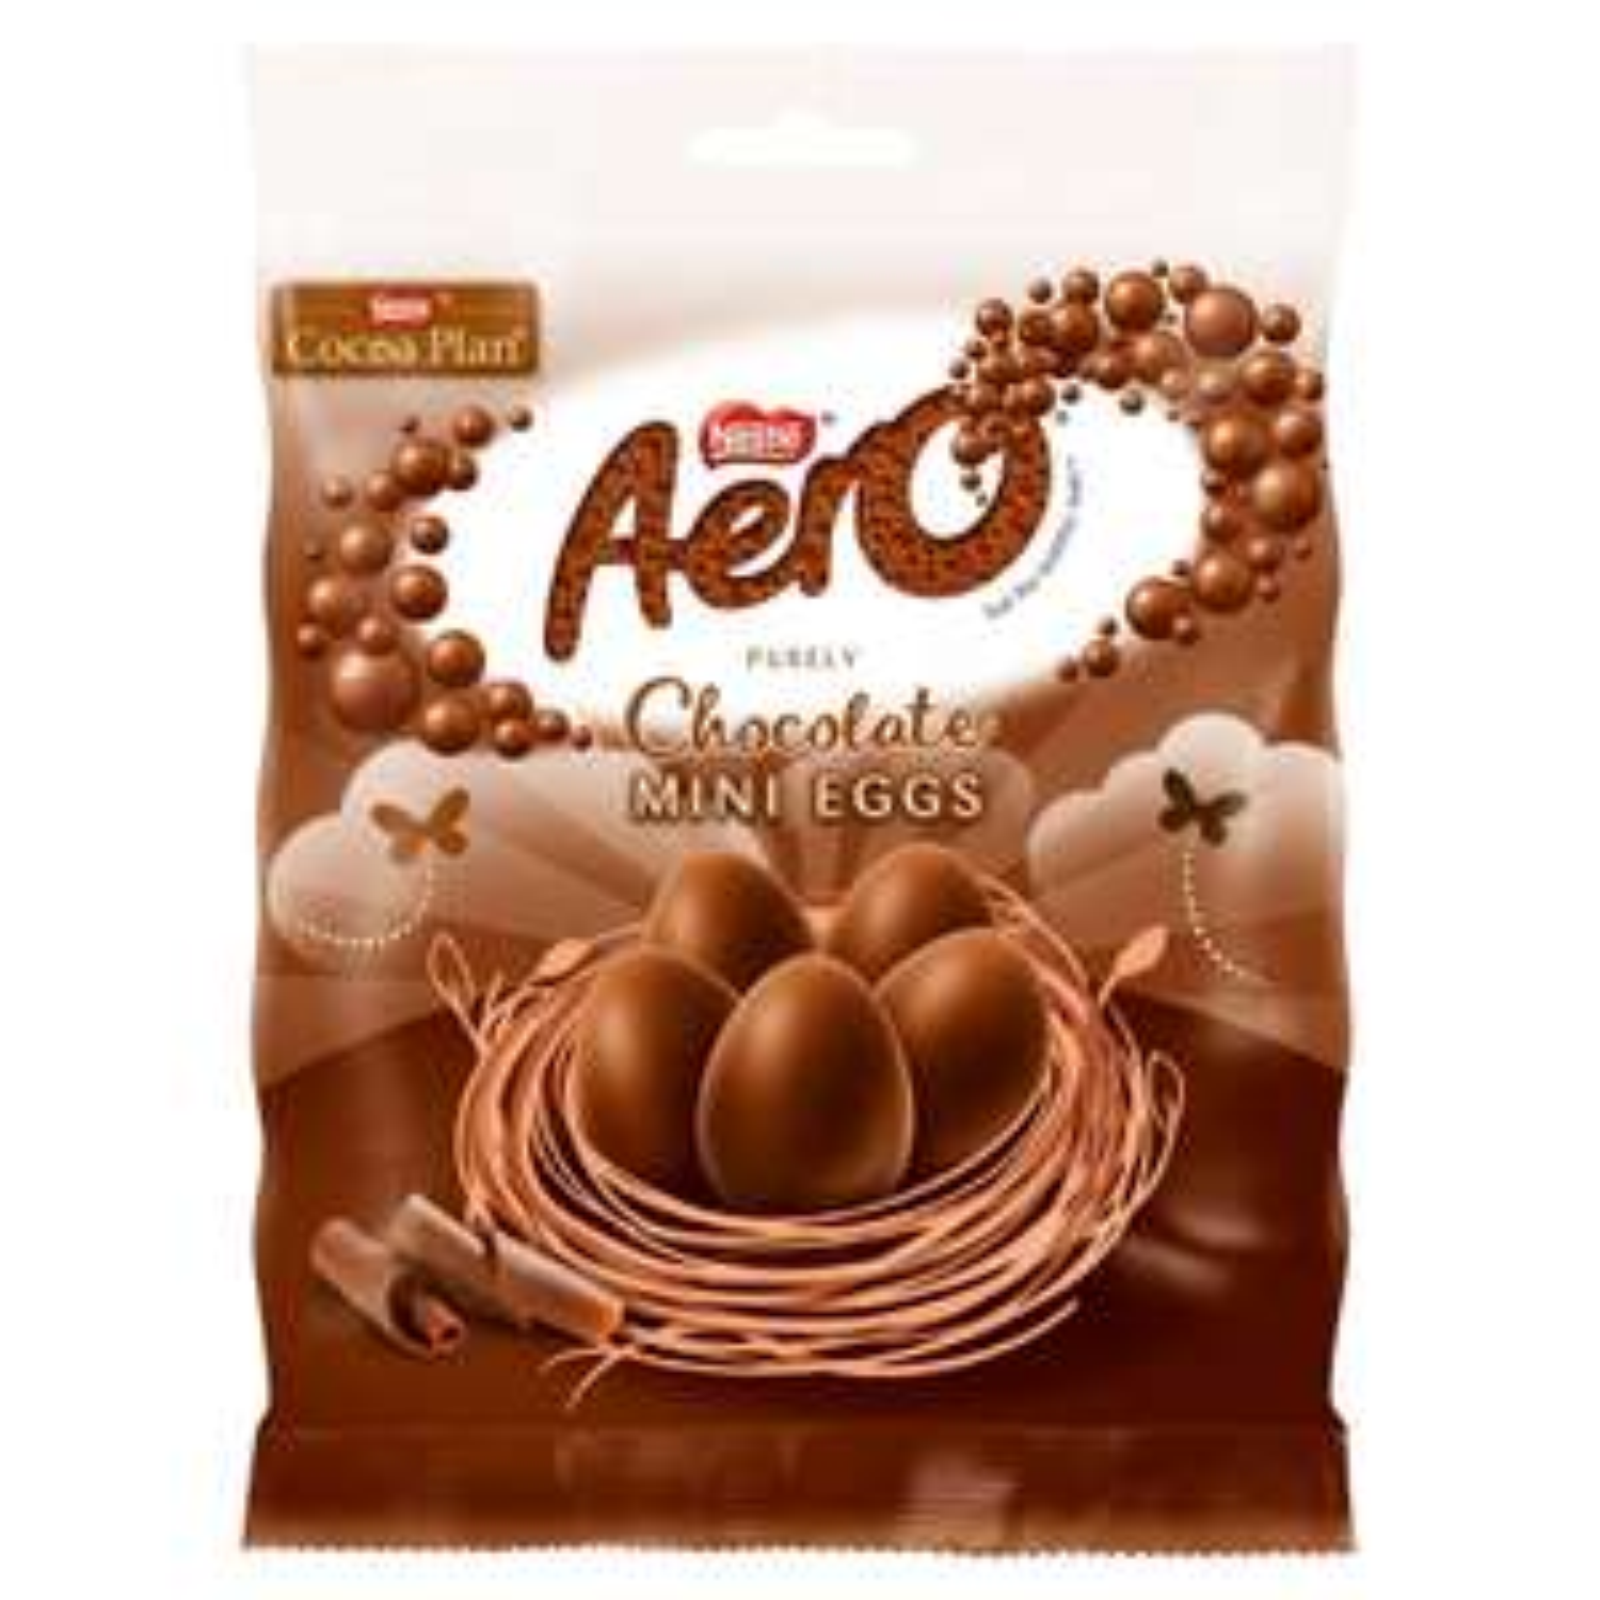 Aero mini eggs milk and peppermint varieties £1 at Tesco. 70g bag